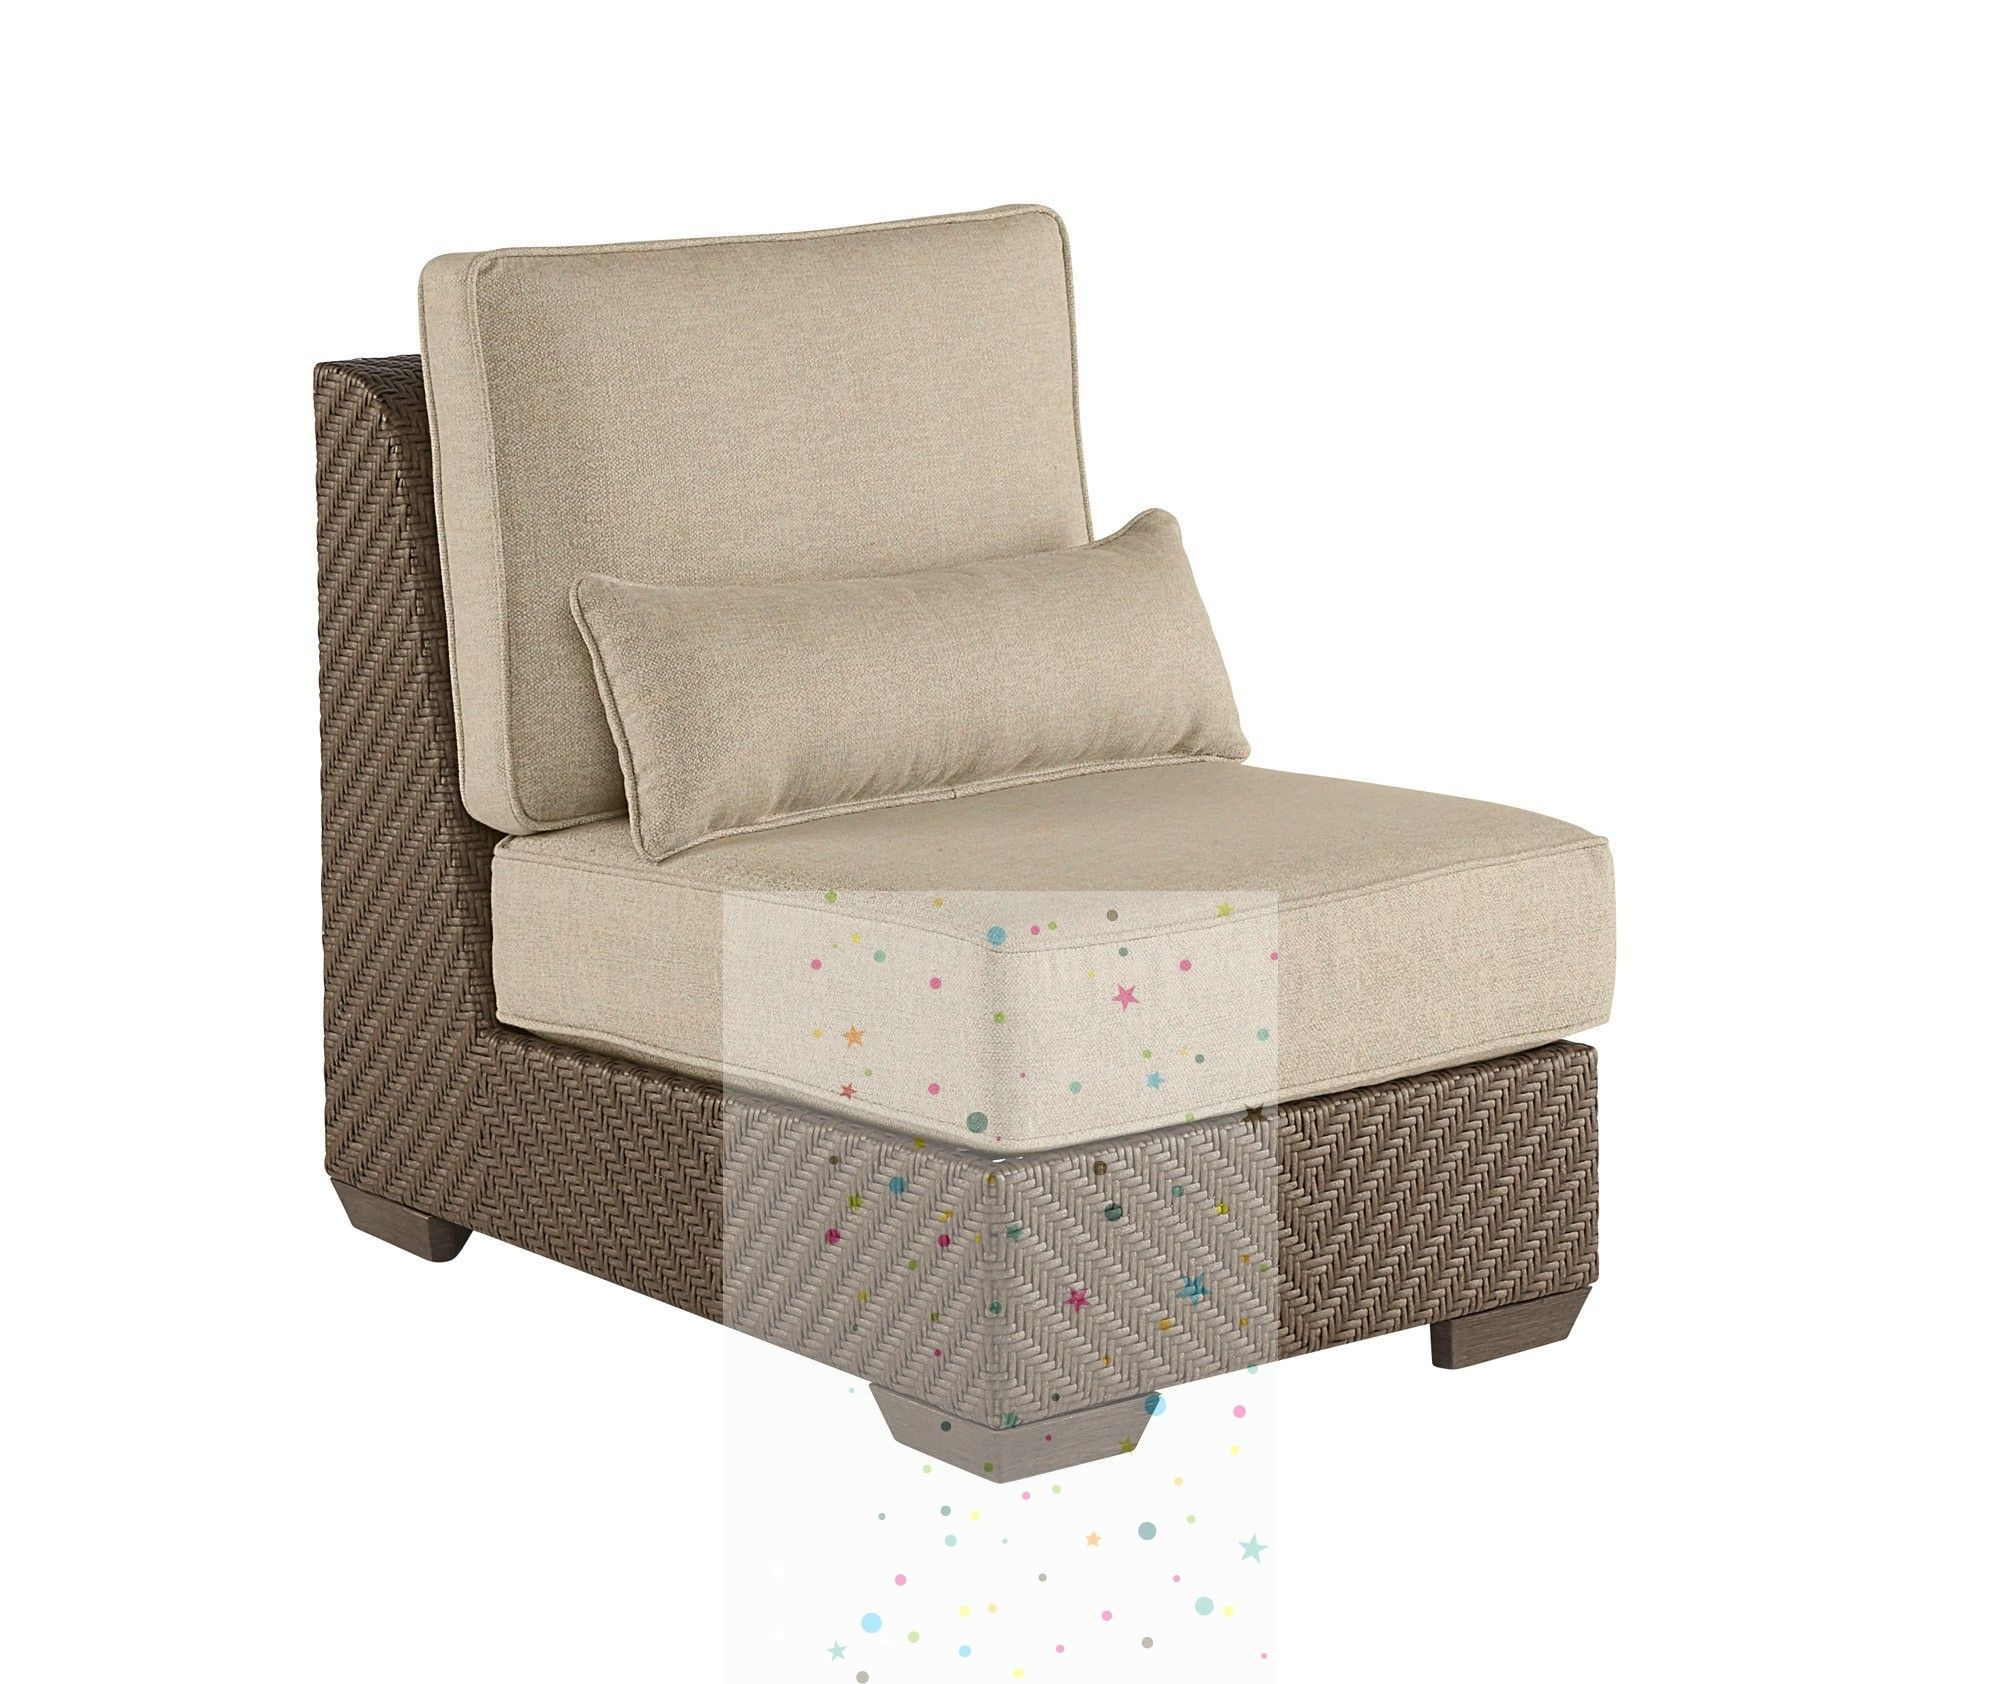 patio string chair swing online pakistan astonishing useful tips wicker lights wedding home table park modern rugs